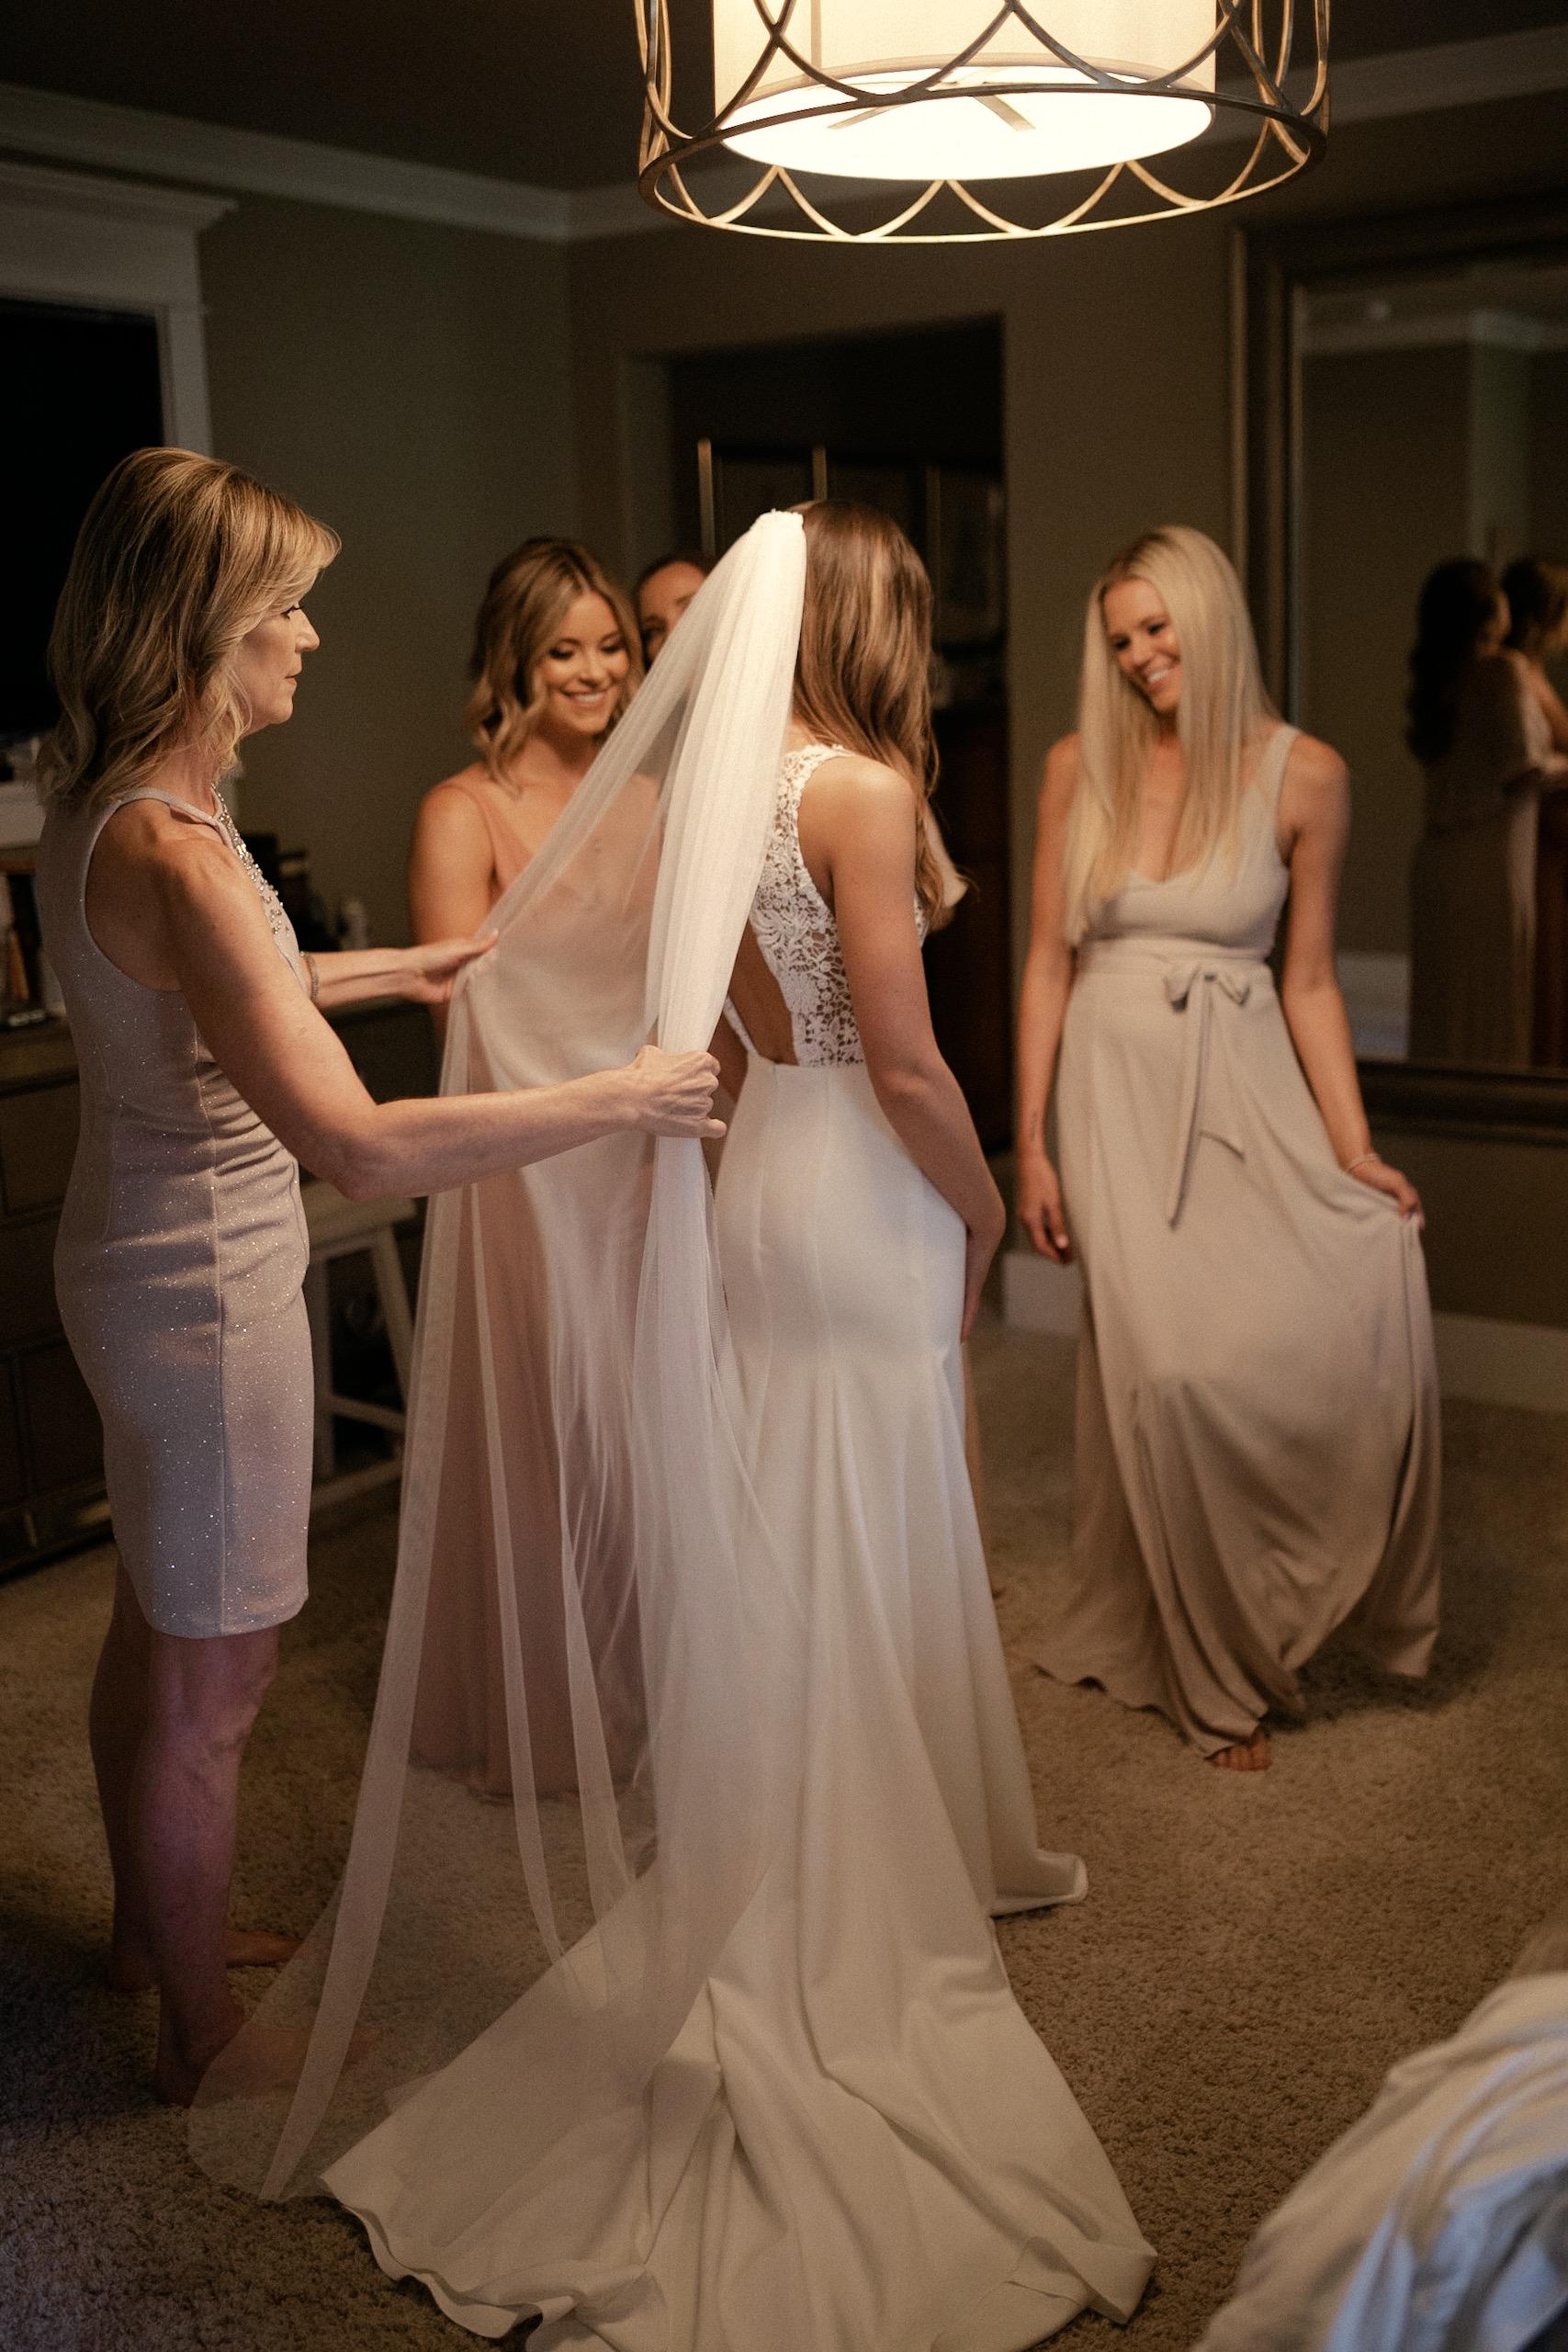 Bride and sisters' dress shot Sarah Seven wedding dress with veil